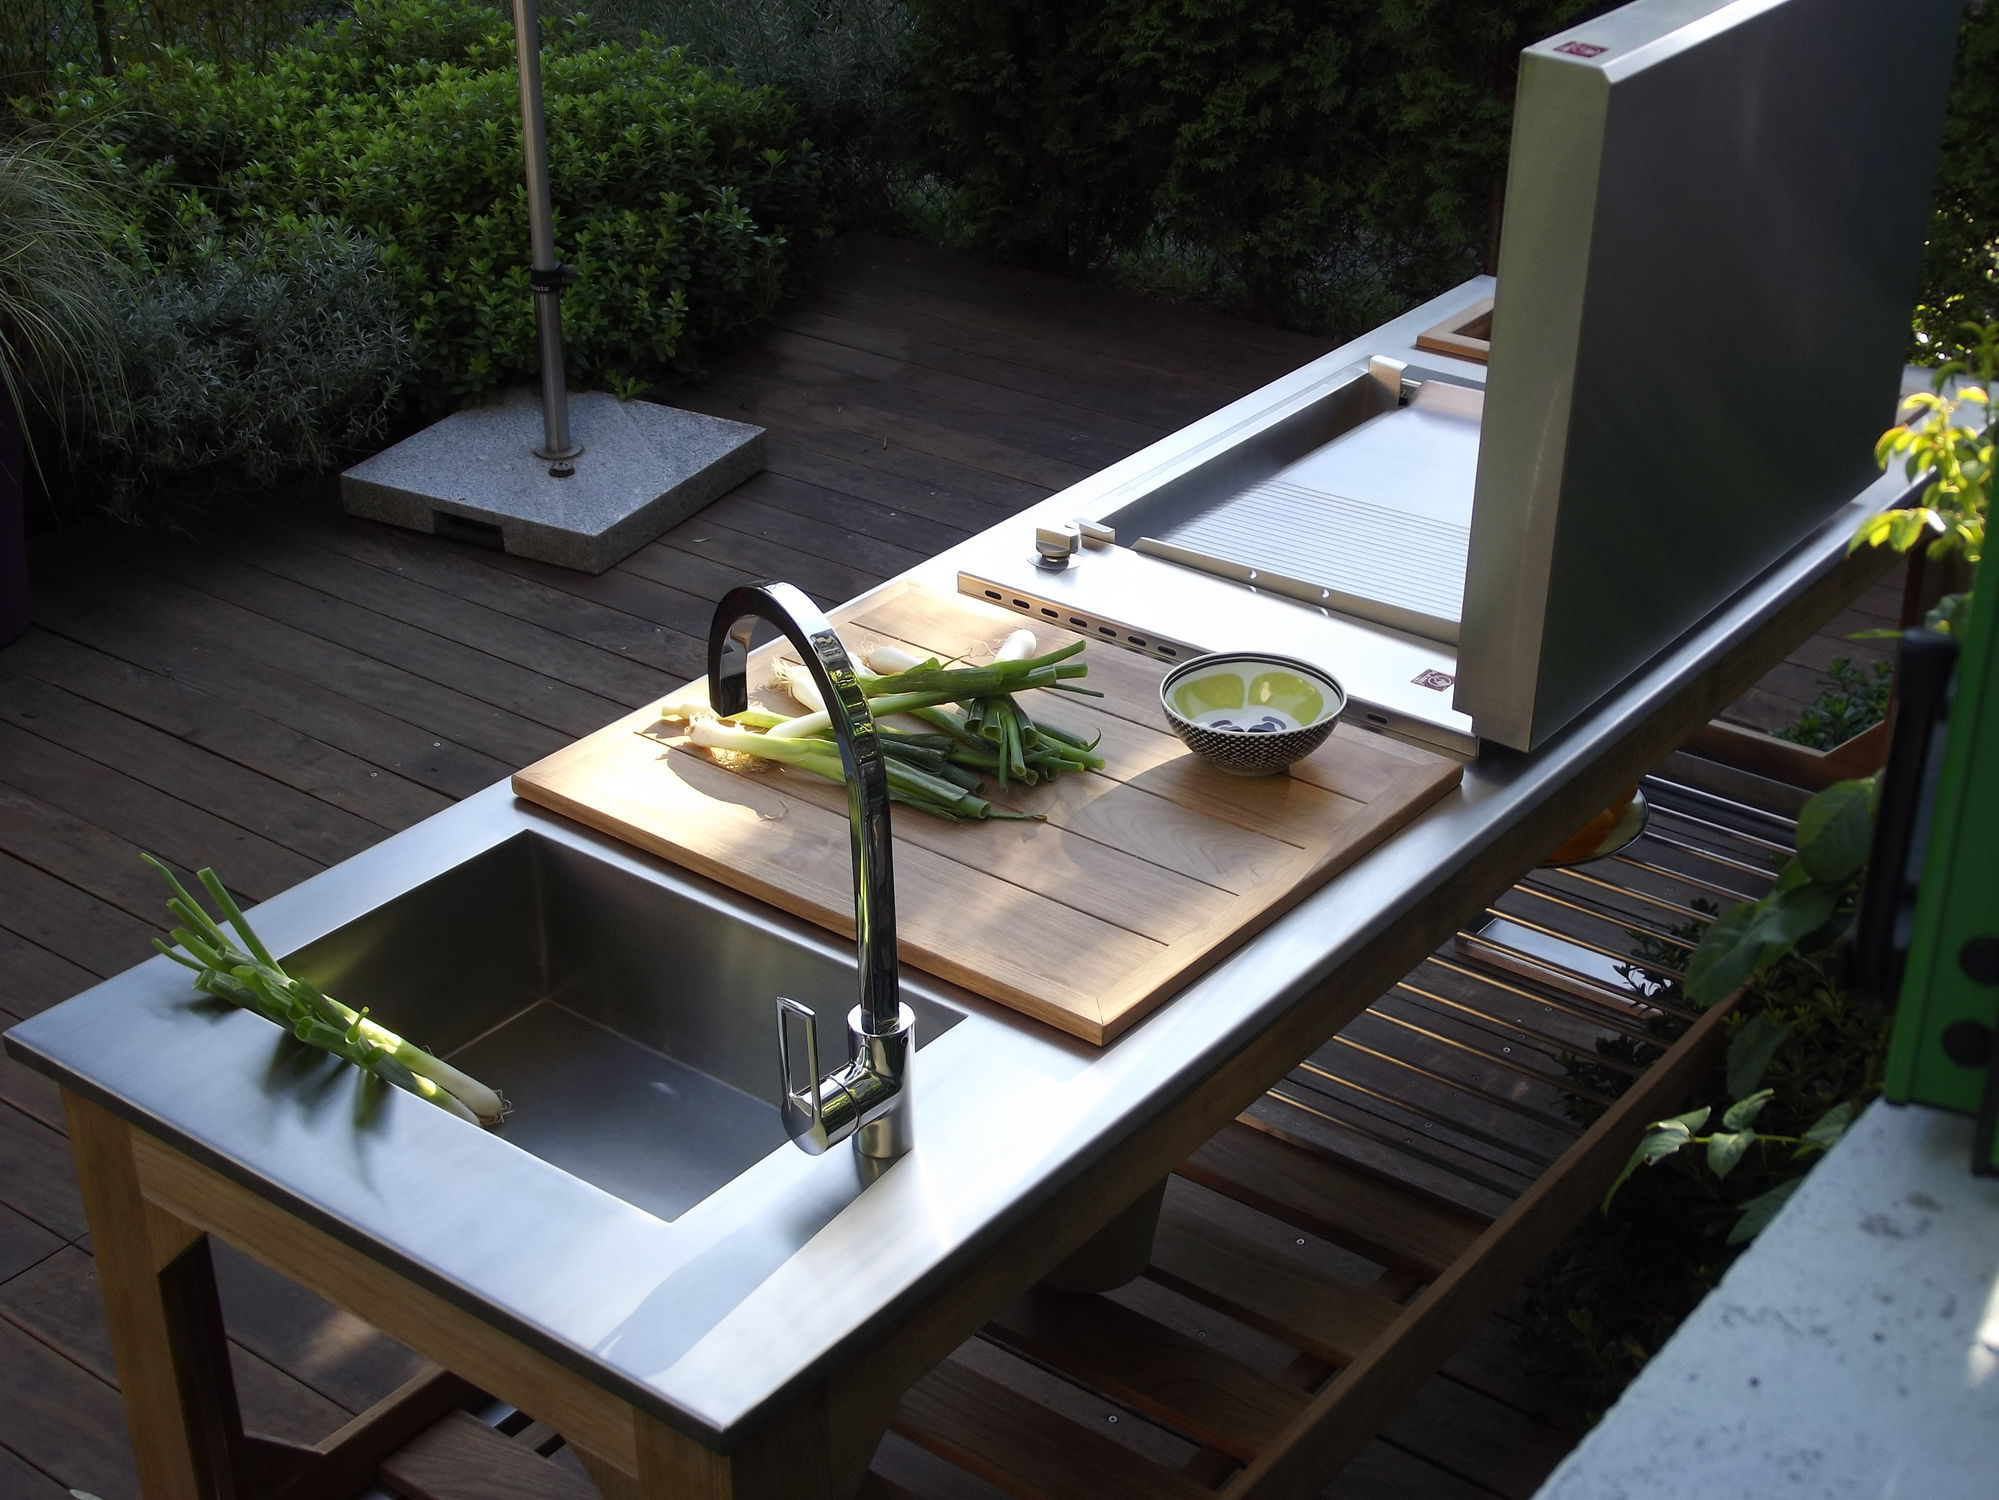 Garten Küche | Garten Kuche Modern Stahl Edelstahl Window Mountain By